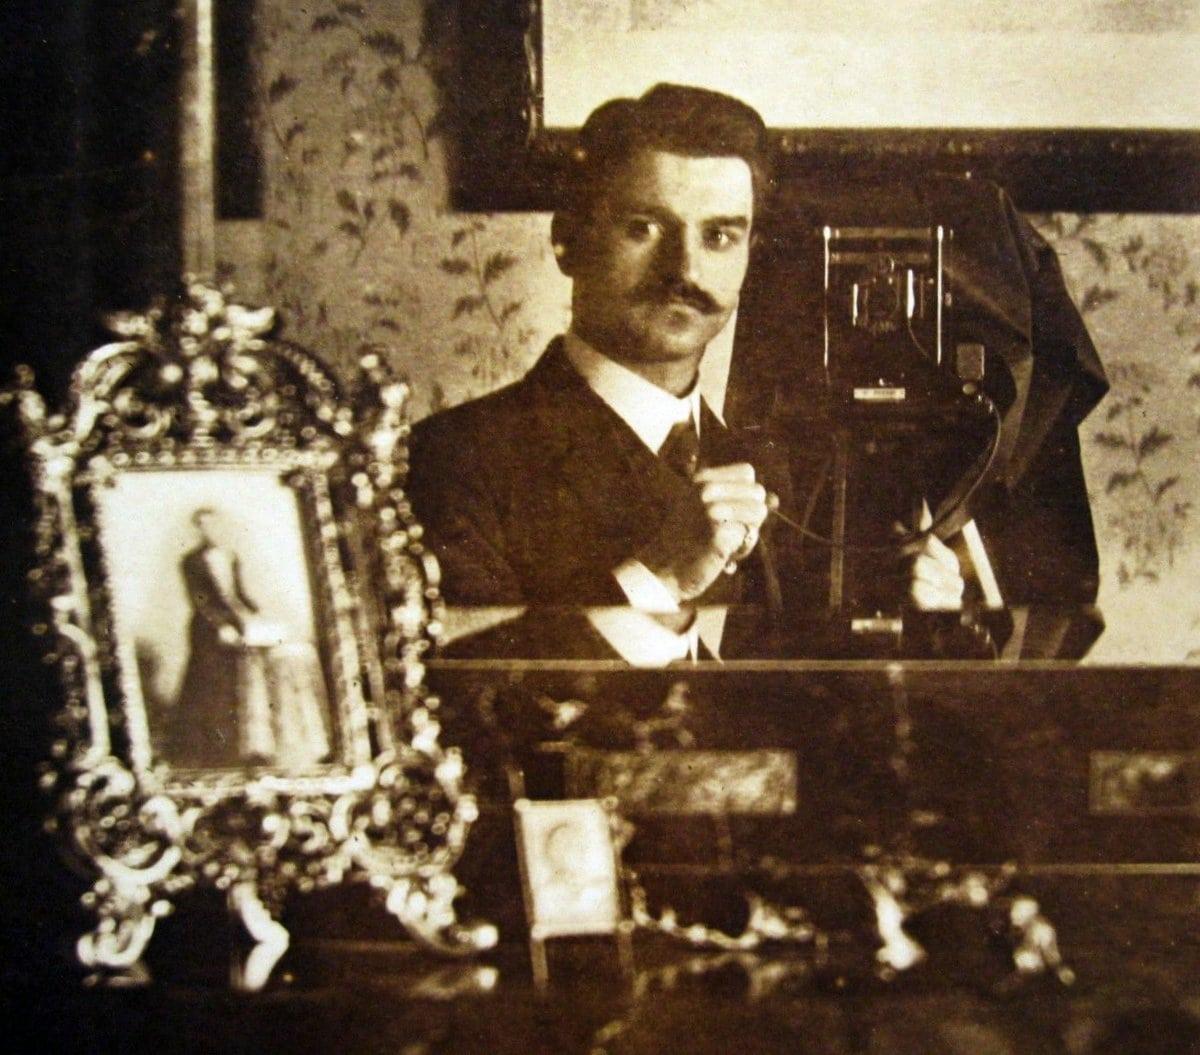 Antique mirror selfie - Late Victorian era at ClickAmericana com